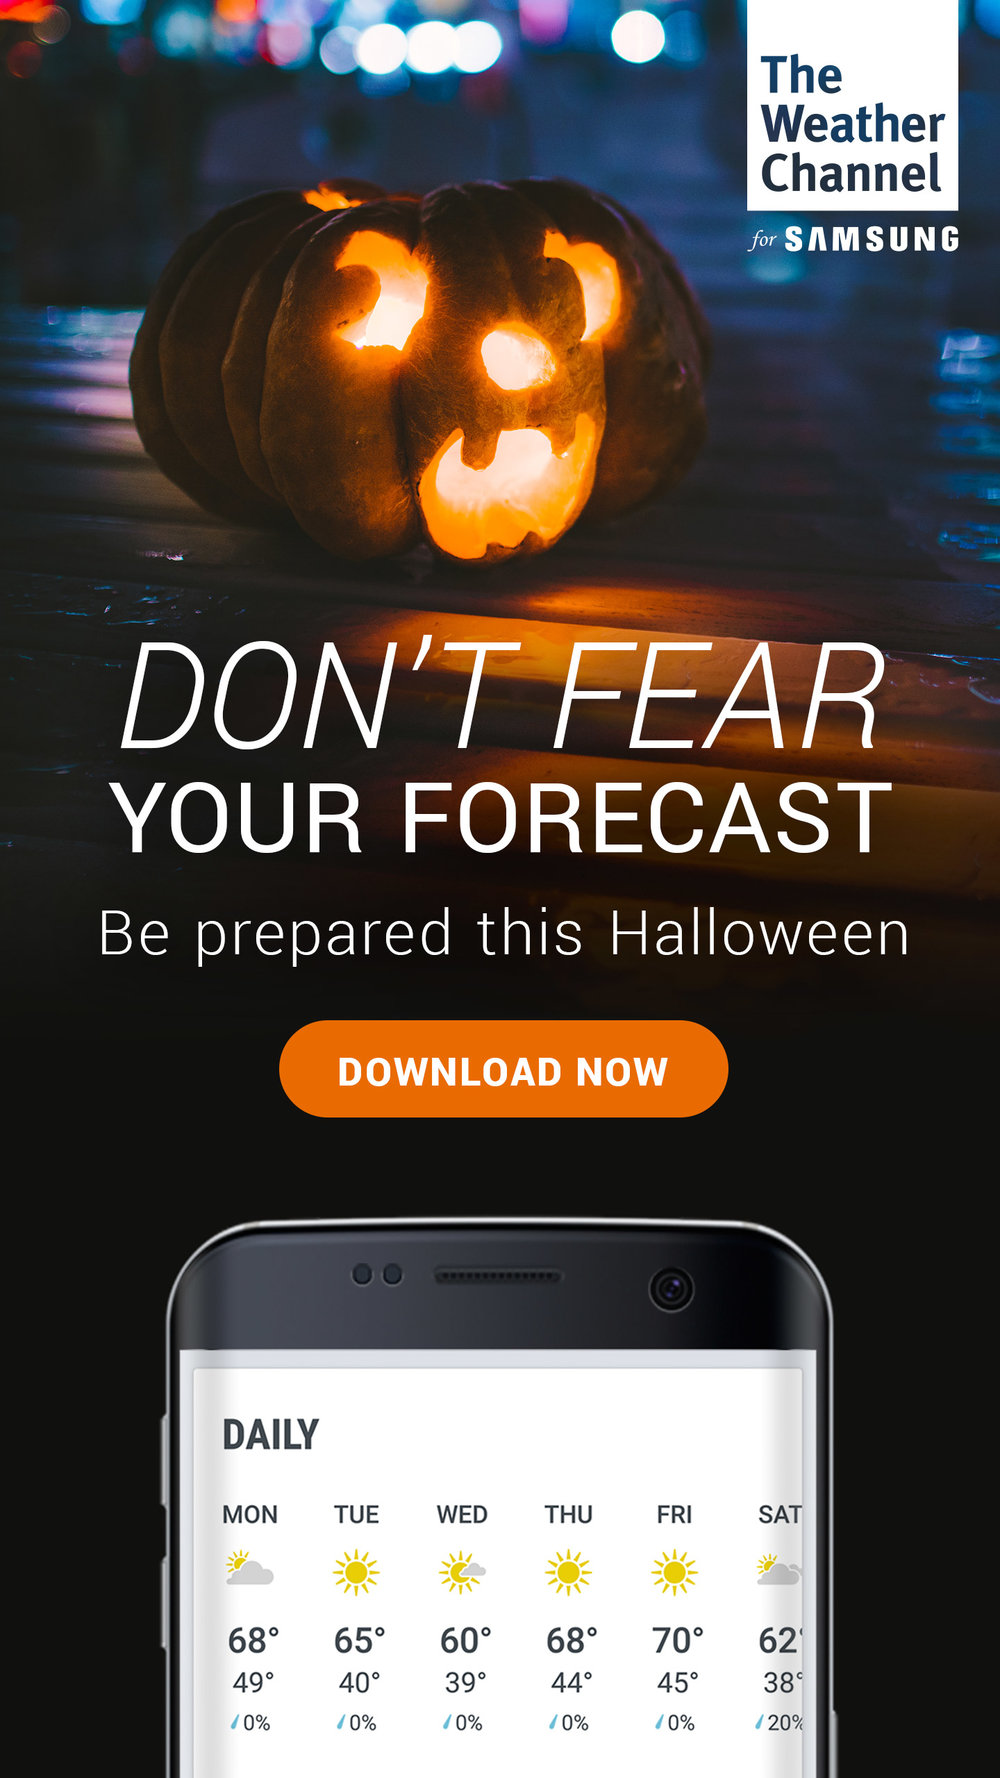 PROD_054_Samsung_PopUp_Halloween_102517.jpg